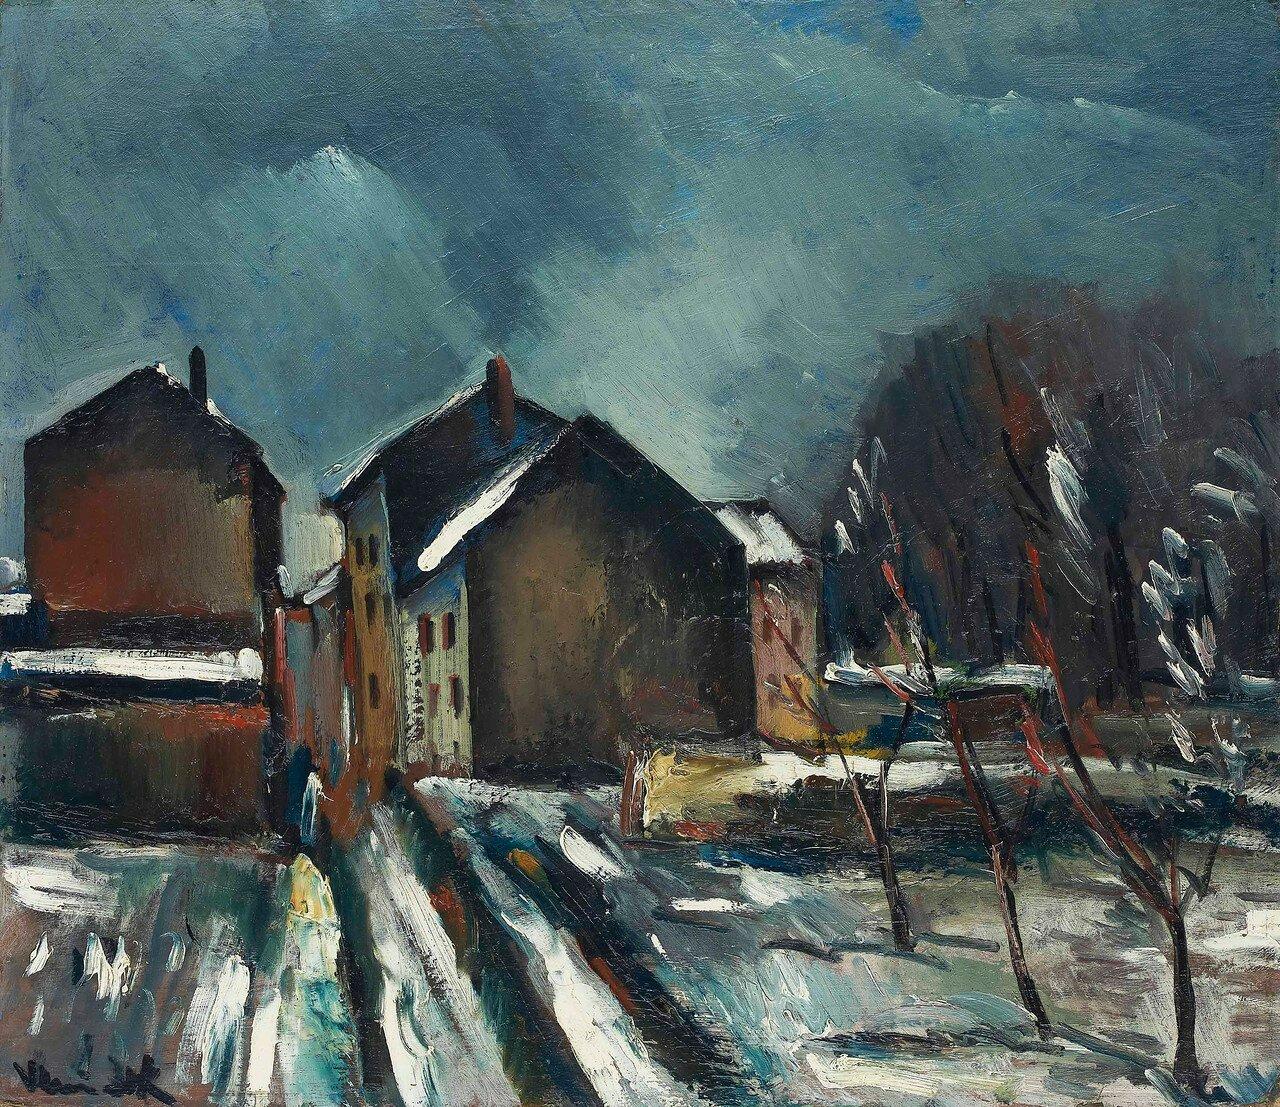 2016_CKS_11794_0243_000(maurice_de_vlaminck_paysage_de_neige).jpg